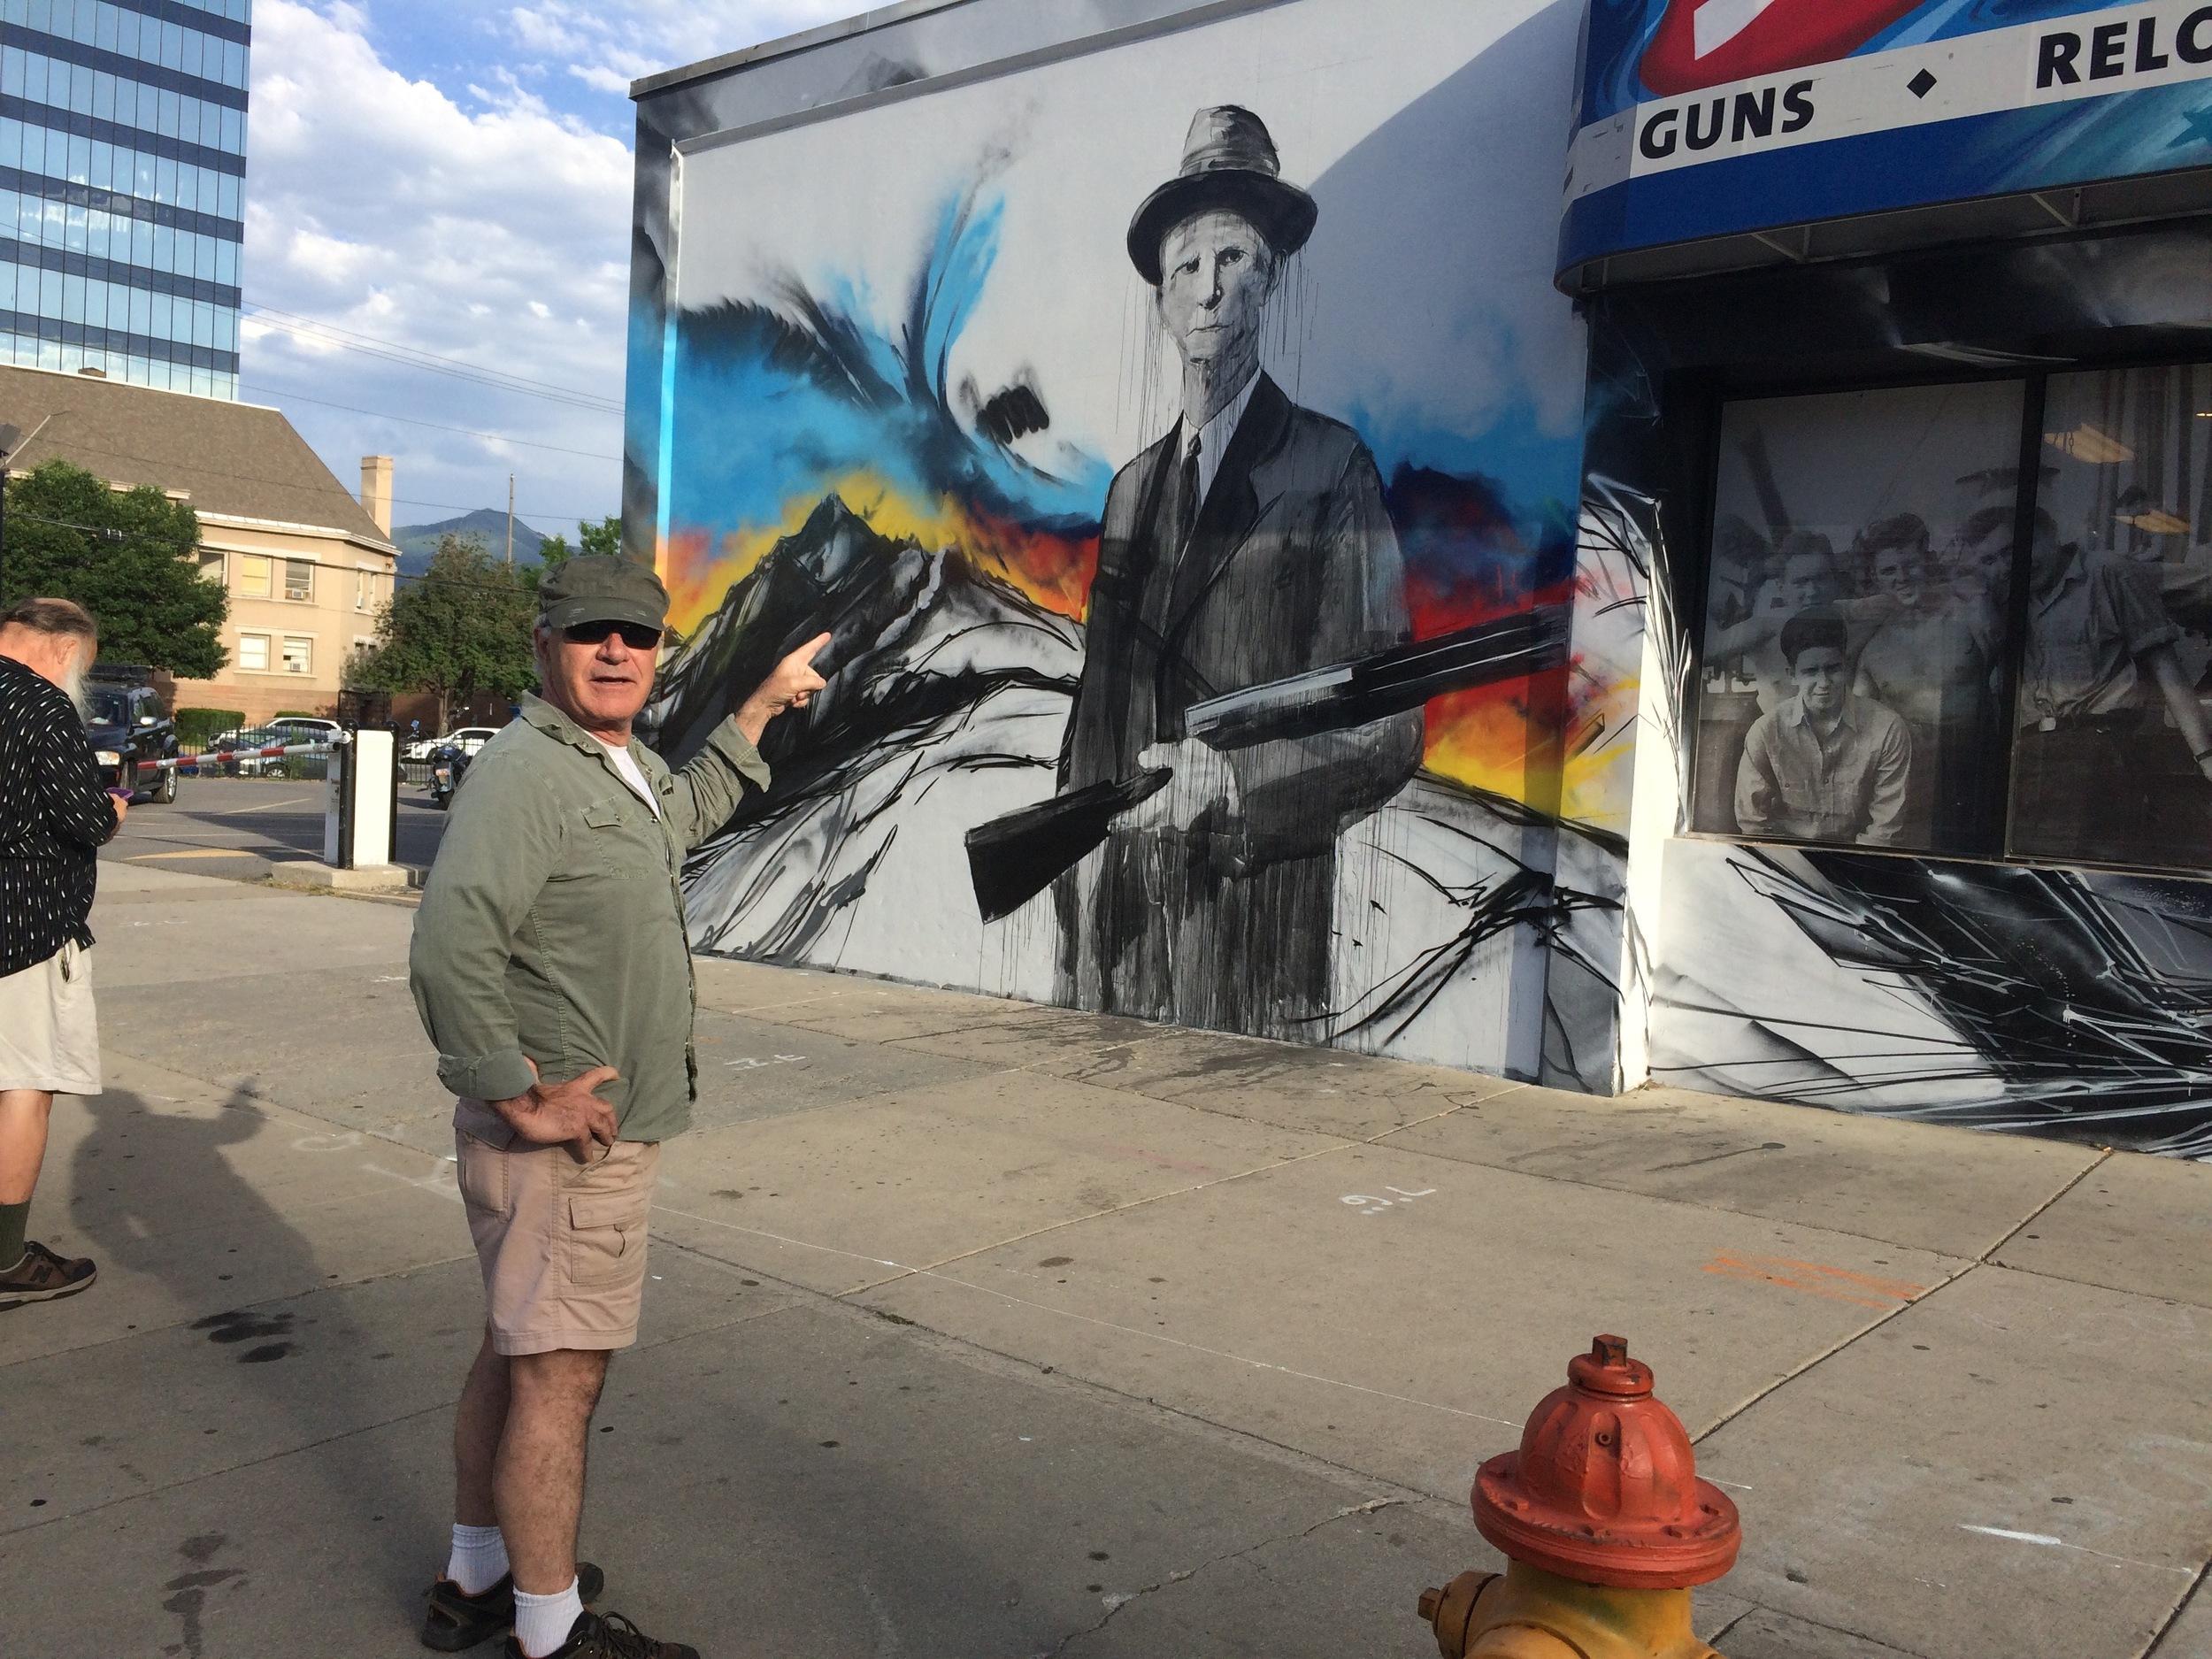 Trent Harris wonders 'what the fuck?' at a gun shop in Salt Lake City.